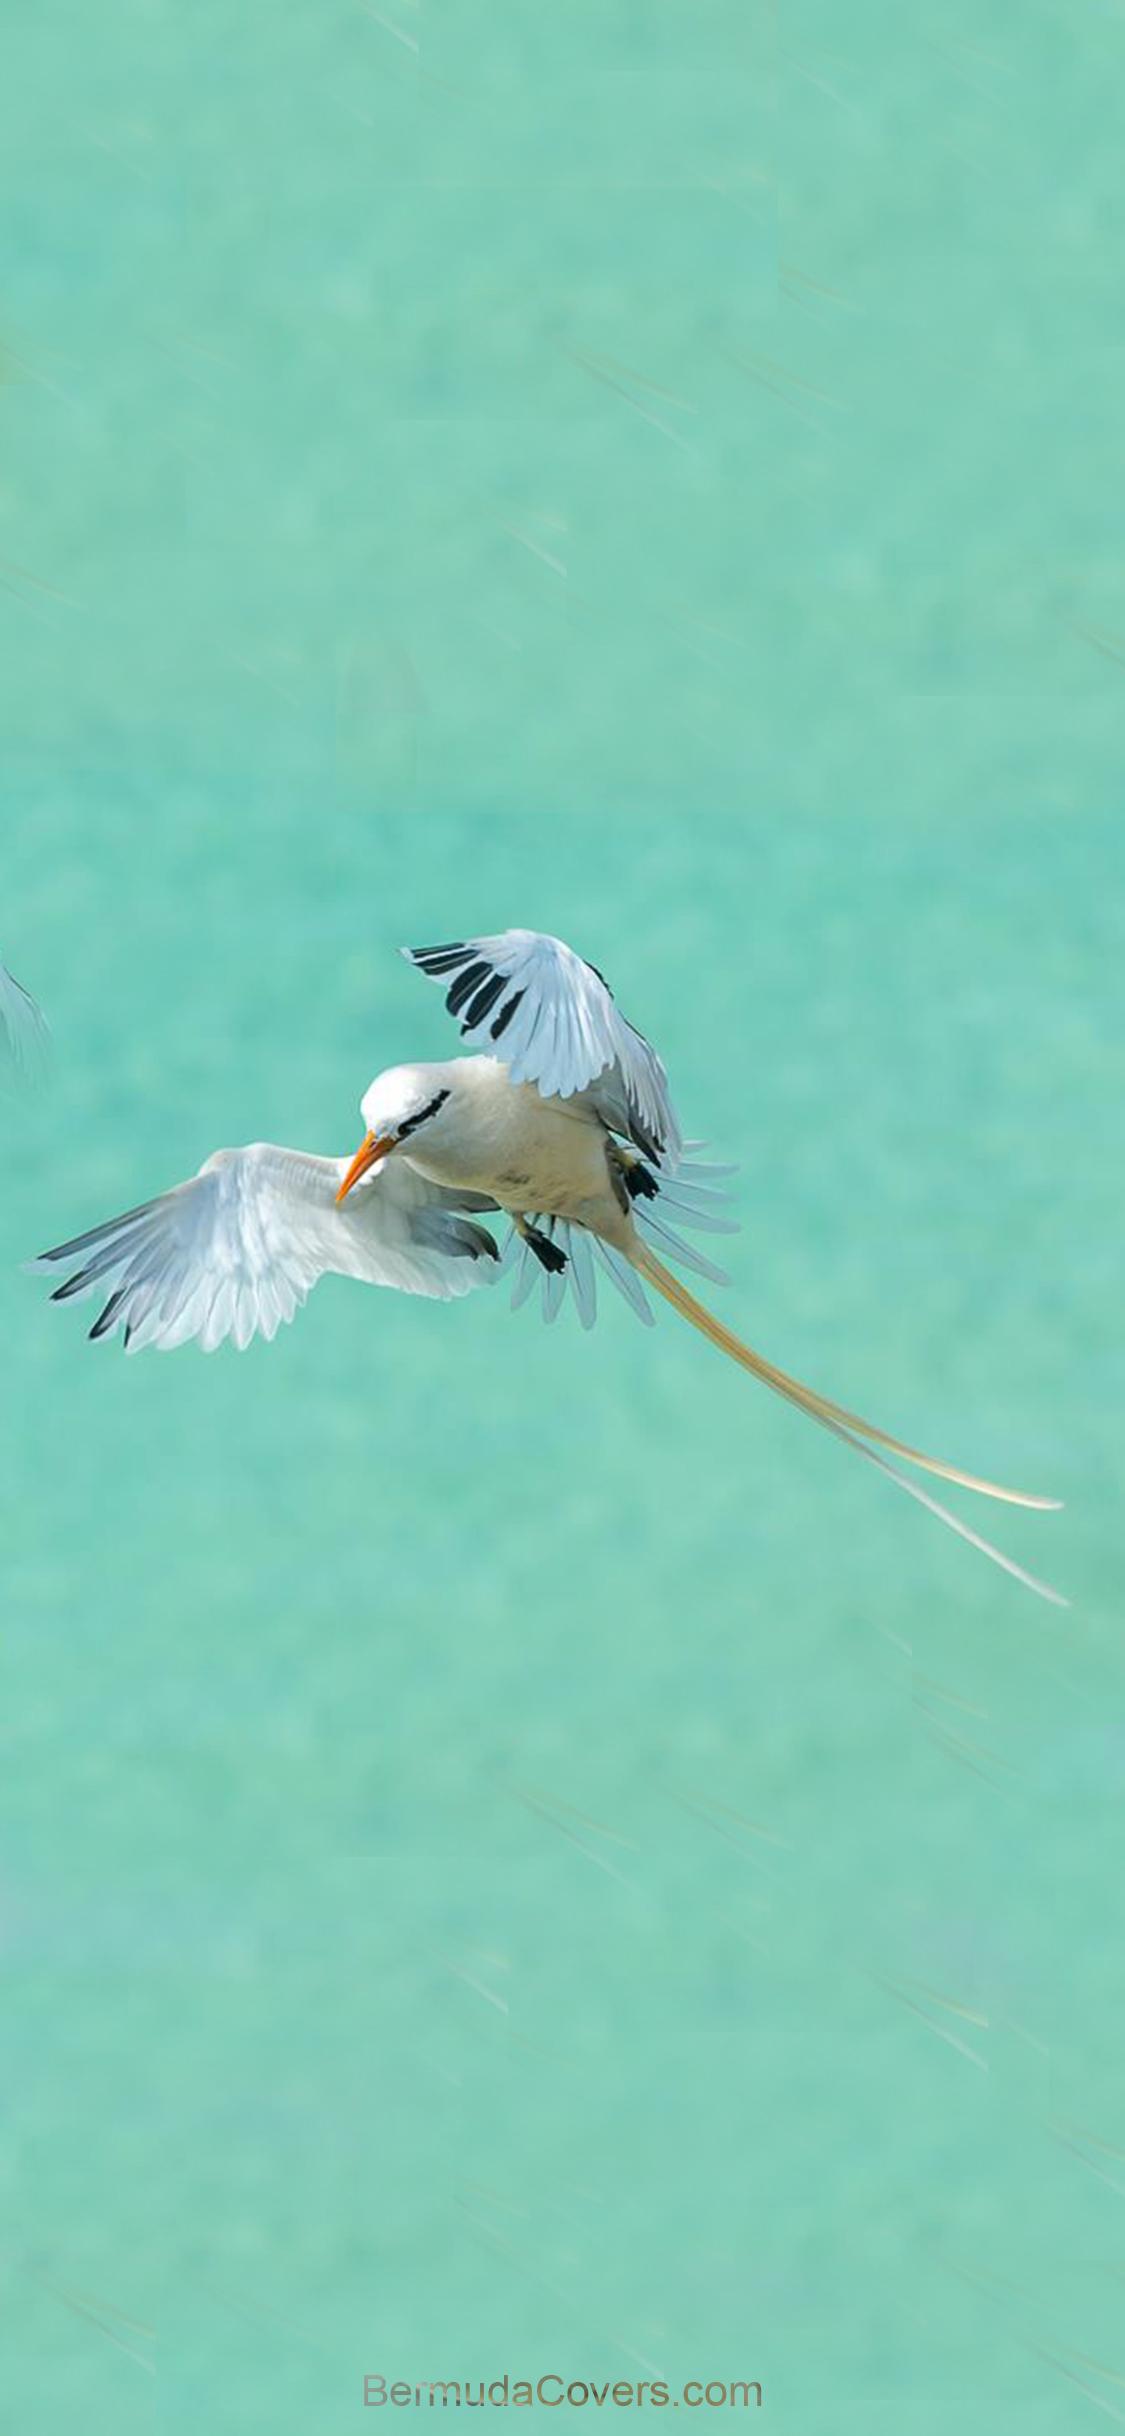 Bermuda-longtail-long-tail-Bernews-Mobile-phone-wallpaper-lock-screen-design-image-photo-QBECvsCk